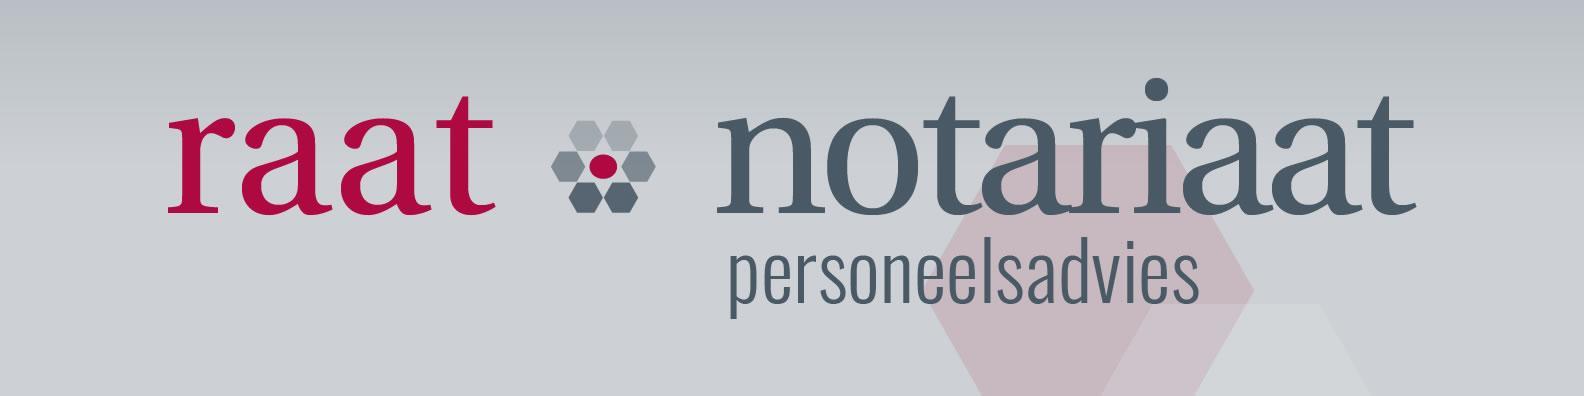 Kandidaat- notaris